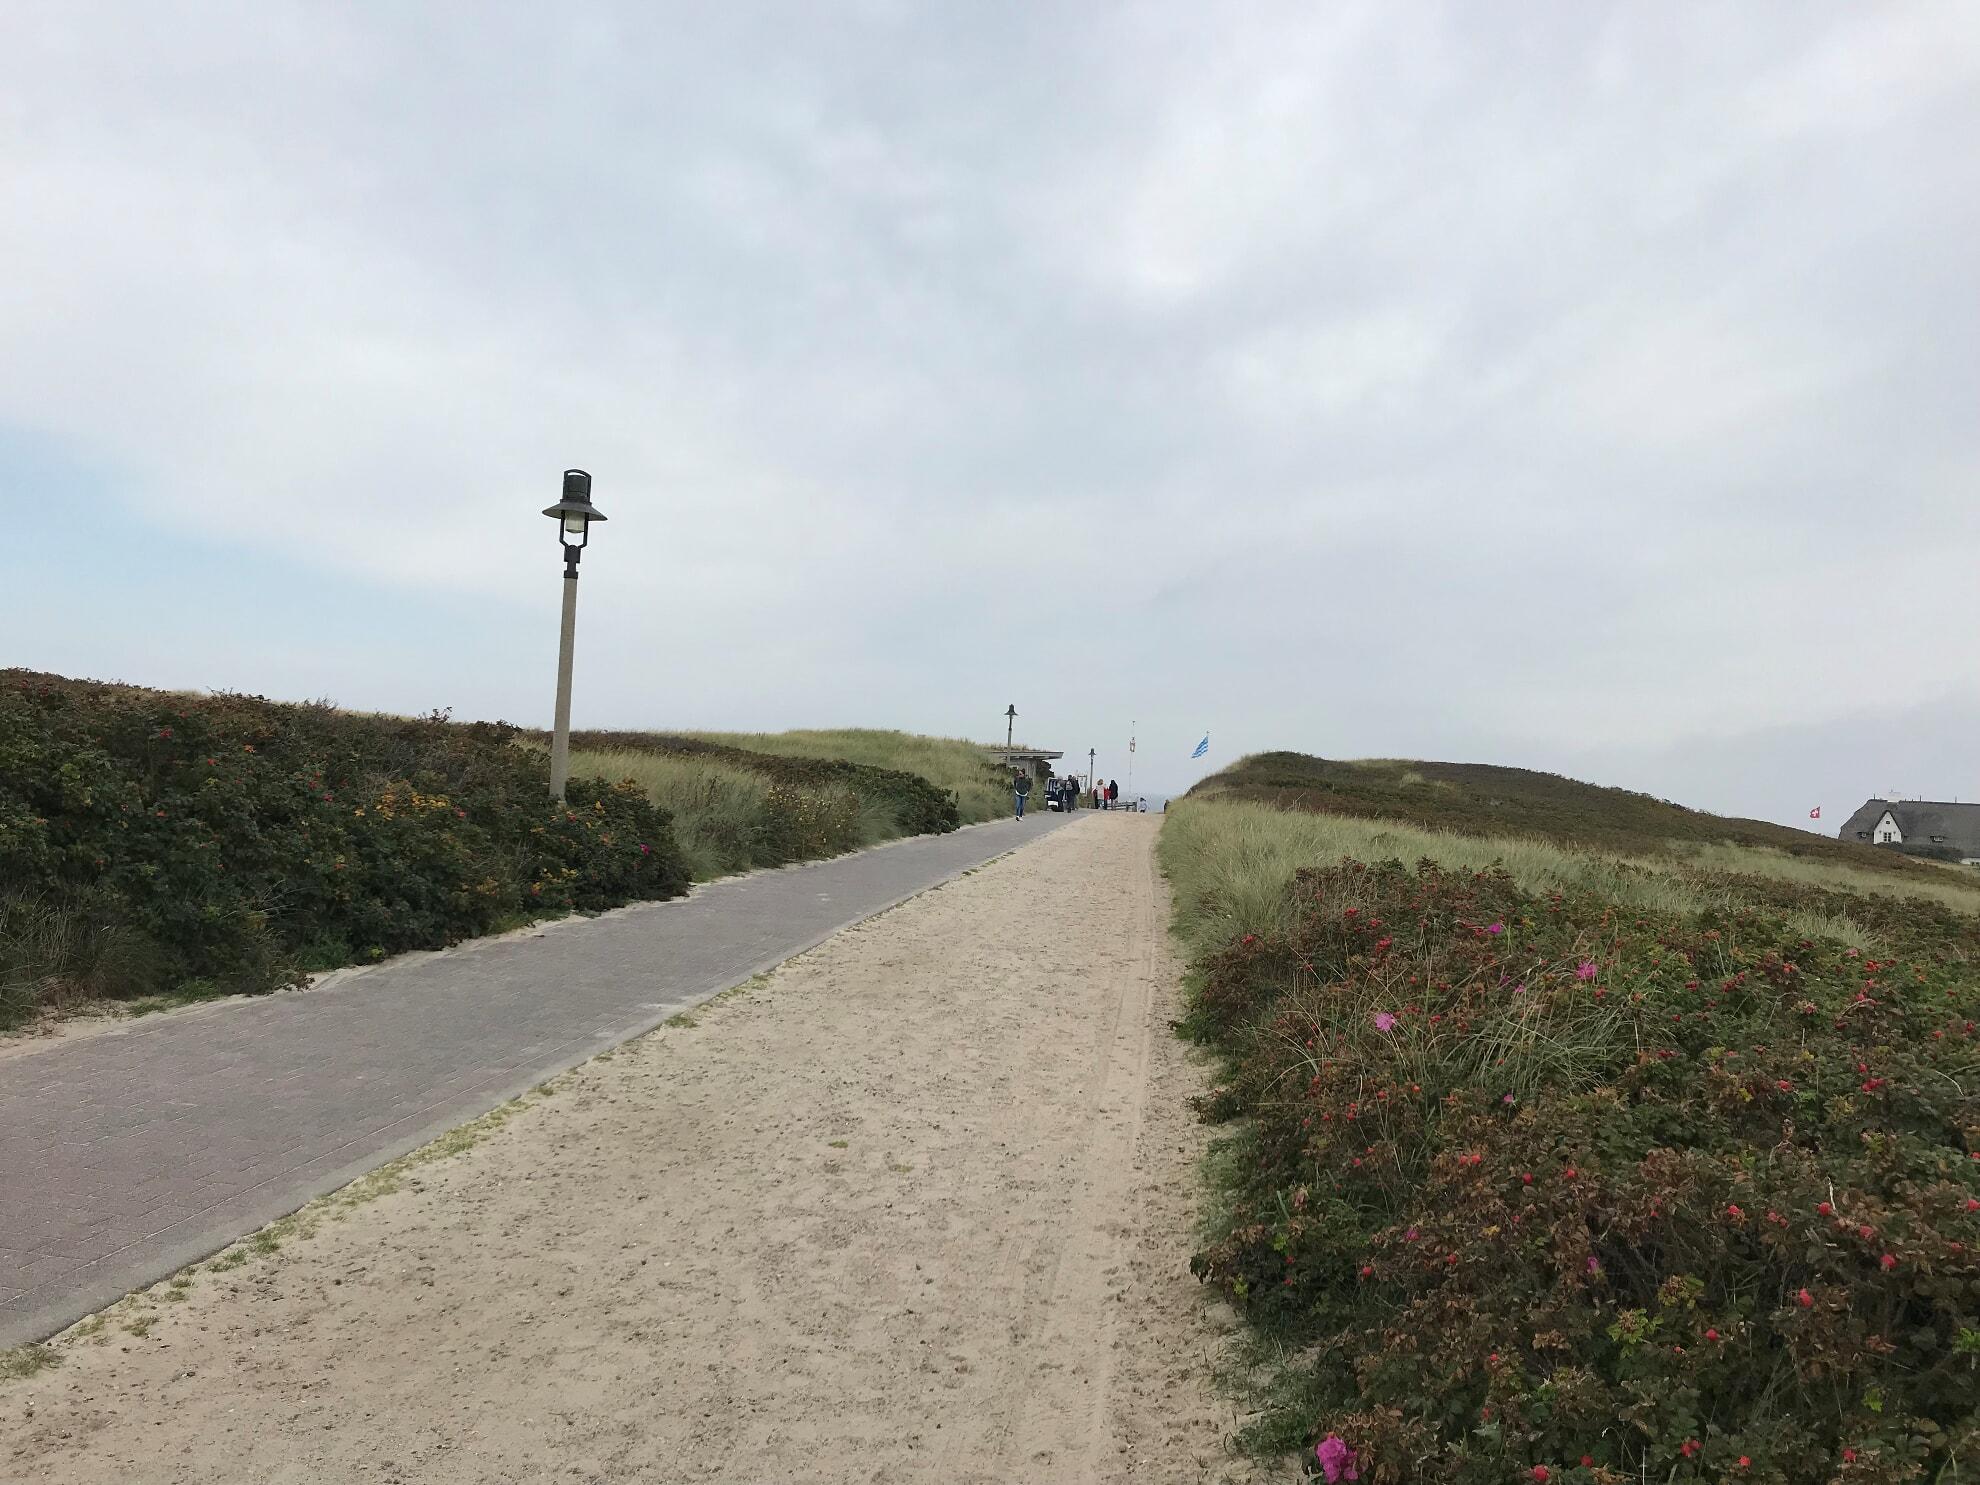 Strandübergang an der Sturmhaube